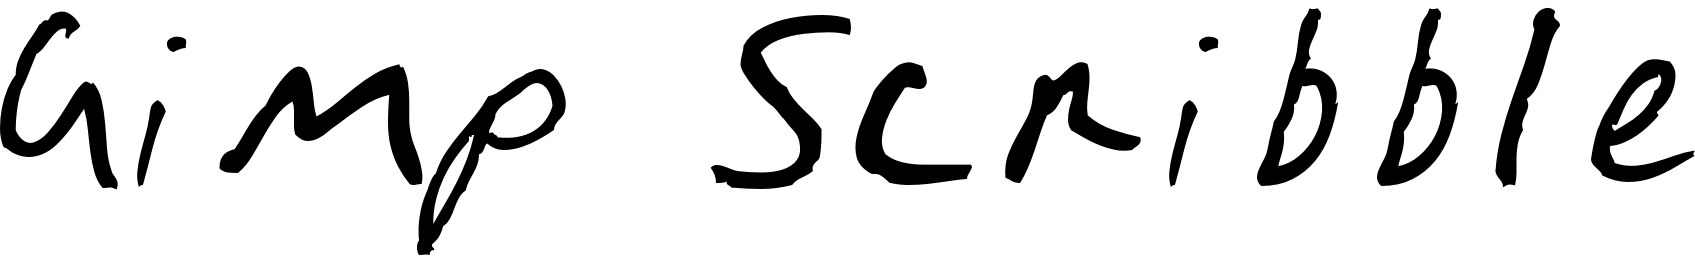 Gimp Scribble